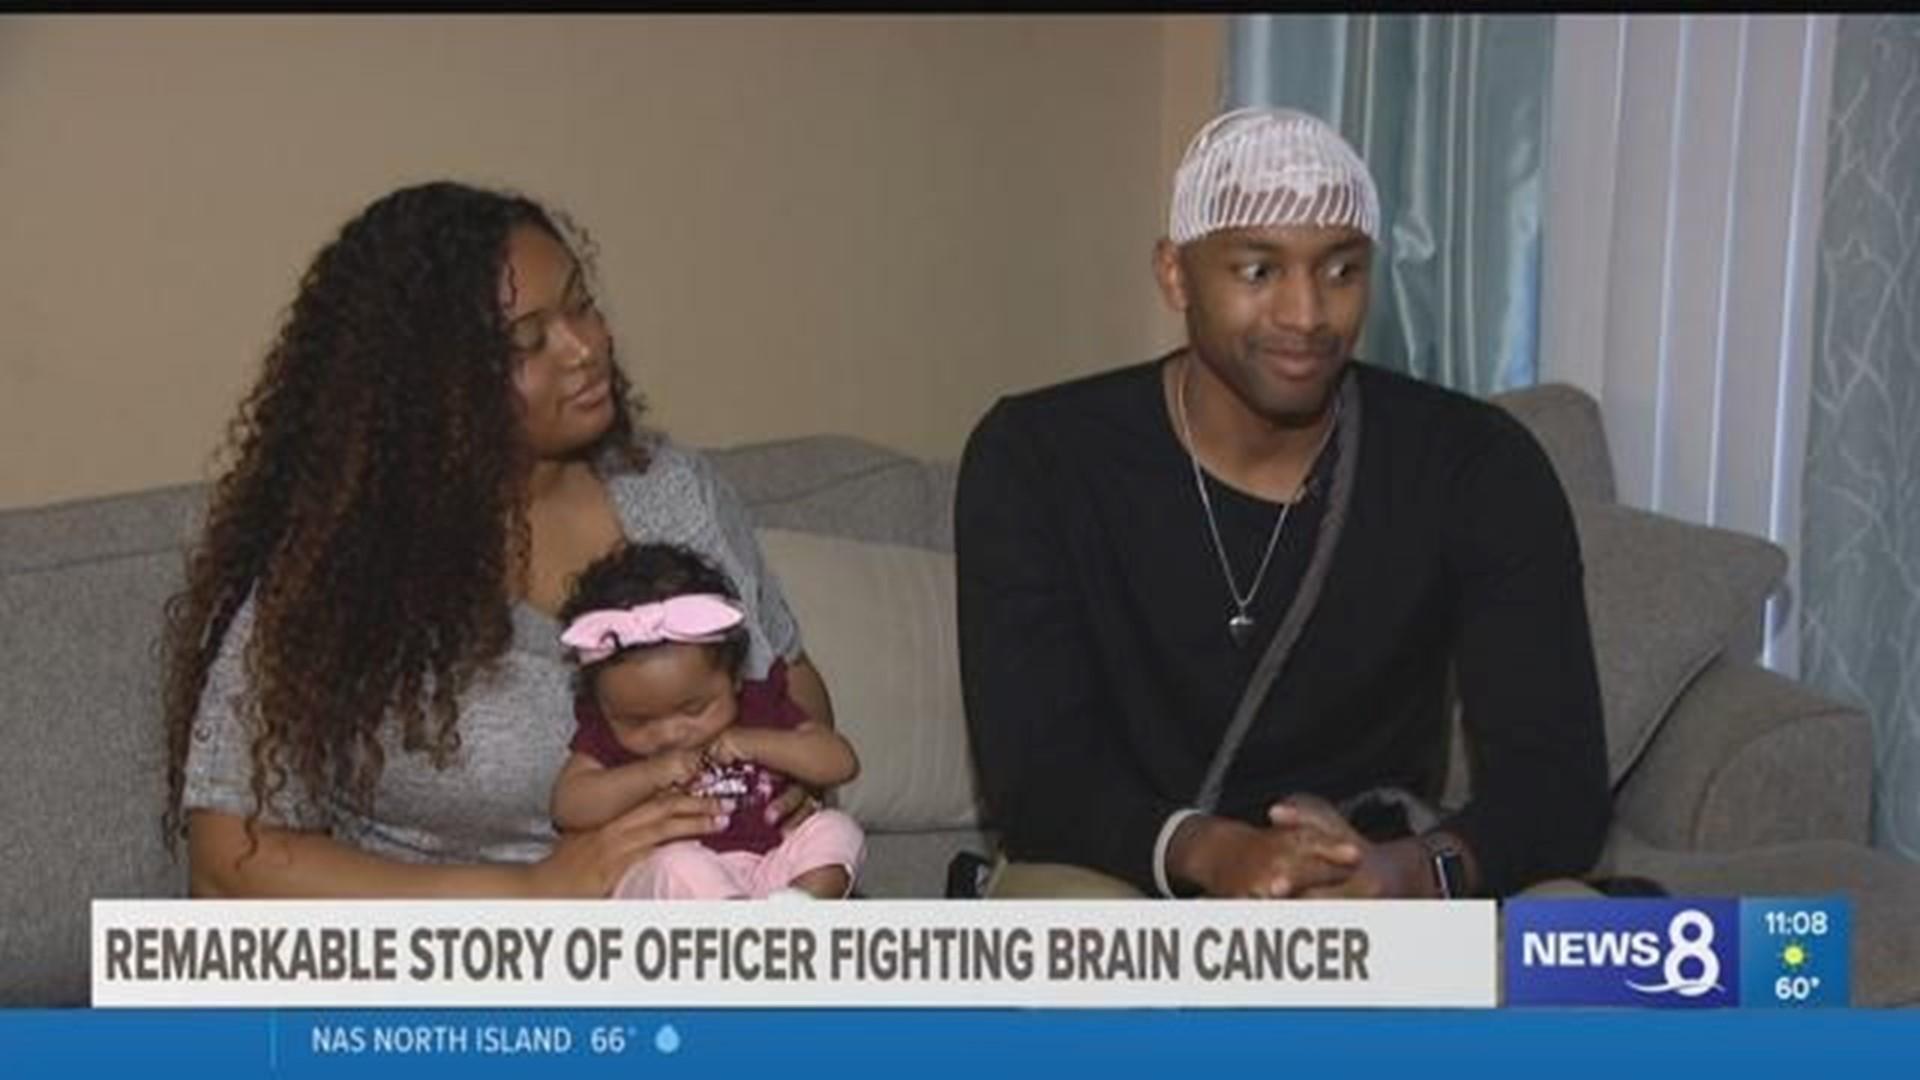 Remarkable Story Of An Oceanside Police Officer Fighting Brain